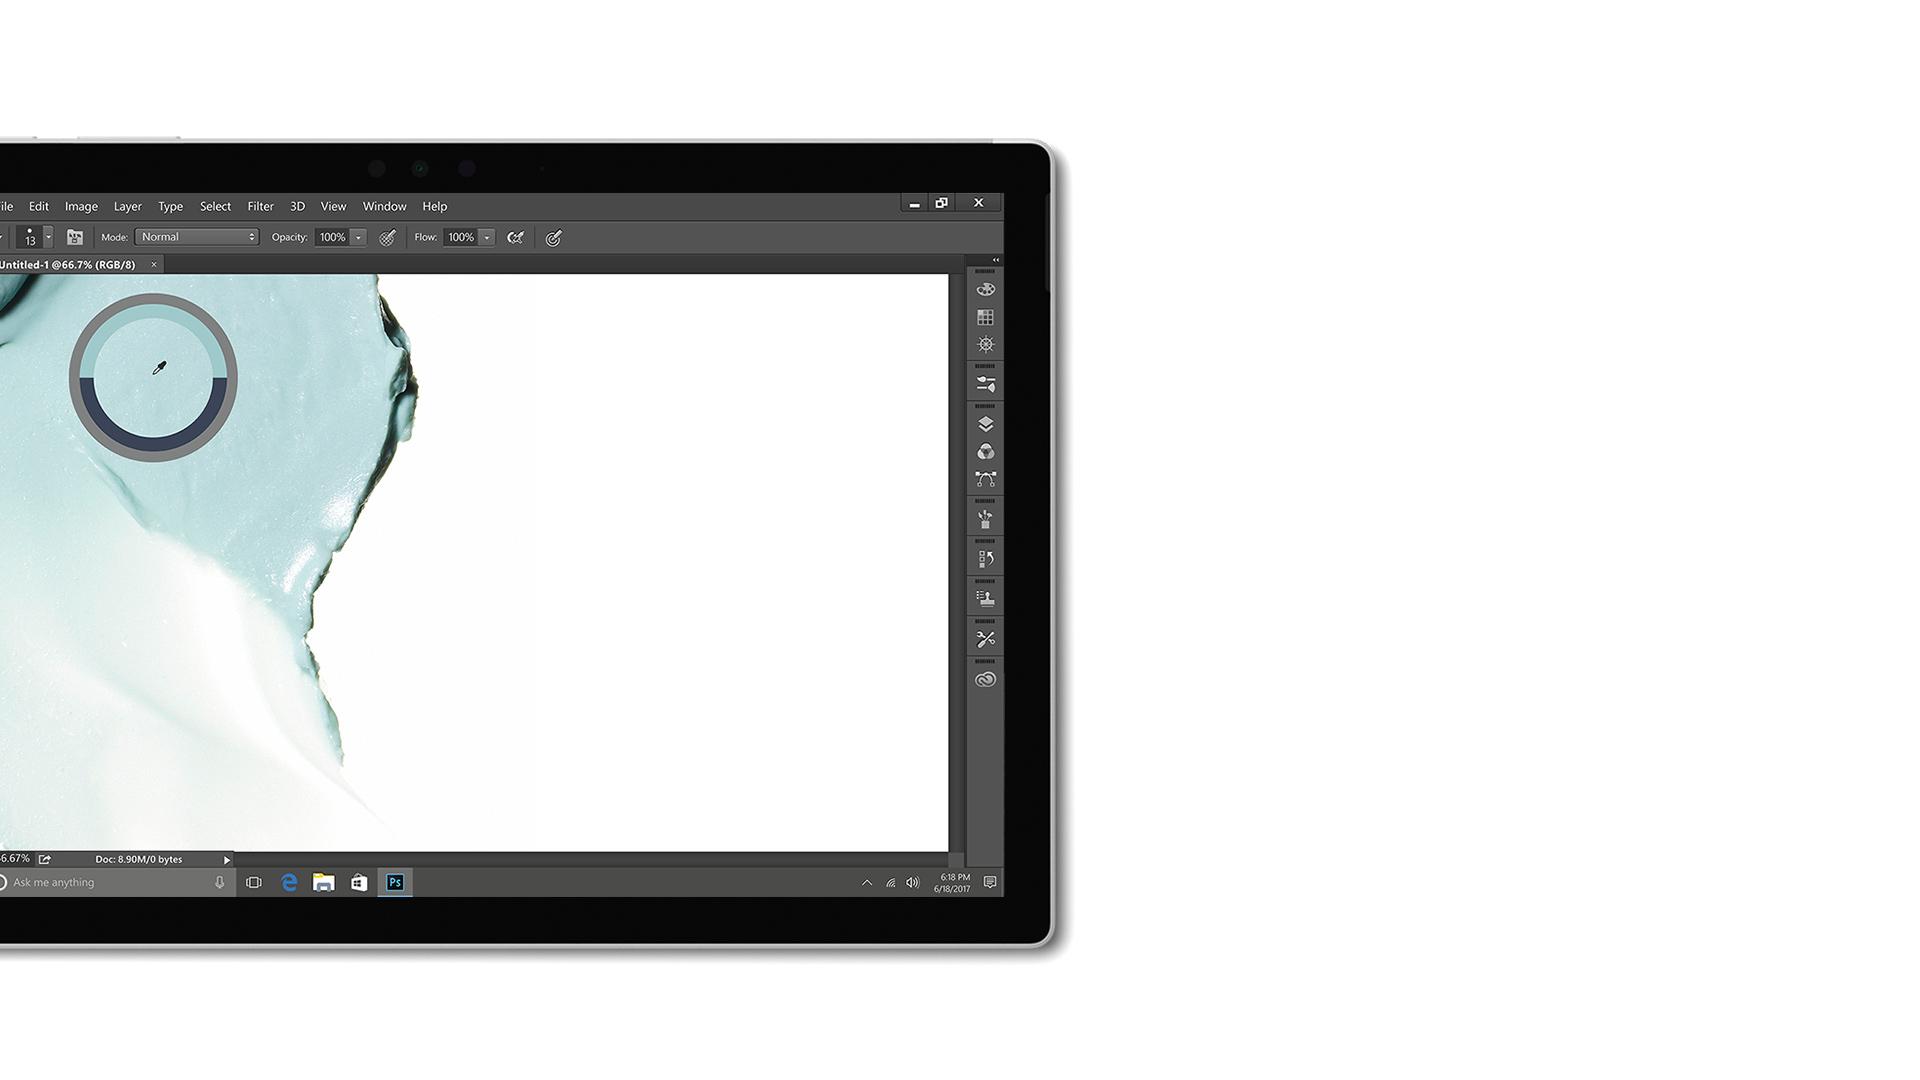 Creative Cloud app screen shot on Surface.